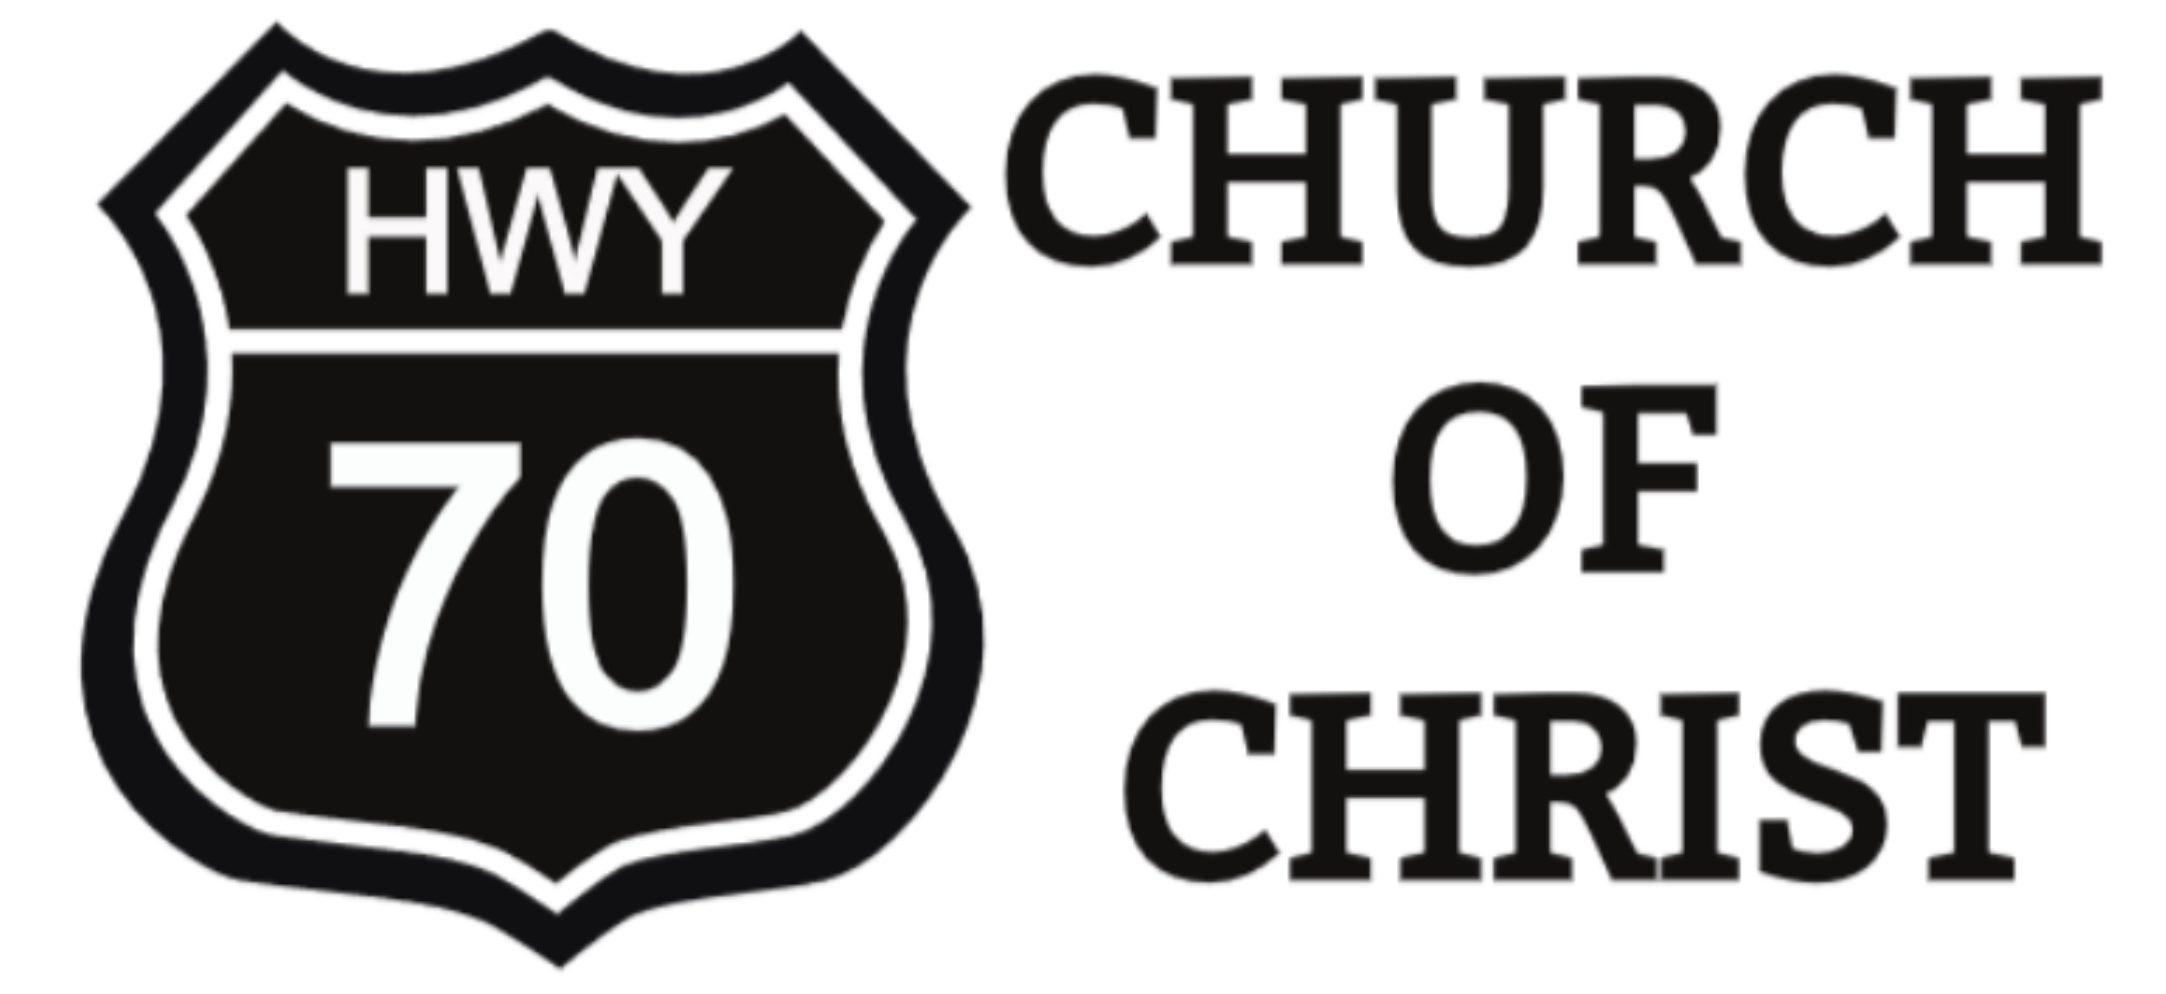 Highway 70 church of Christ